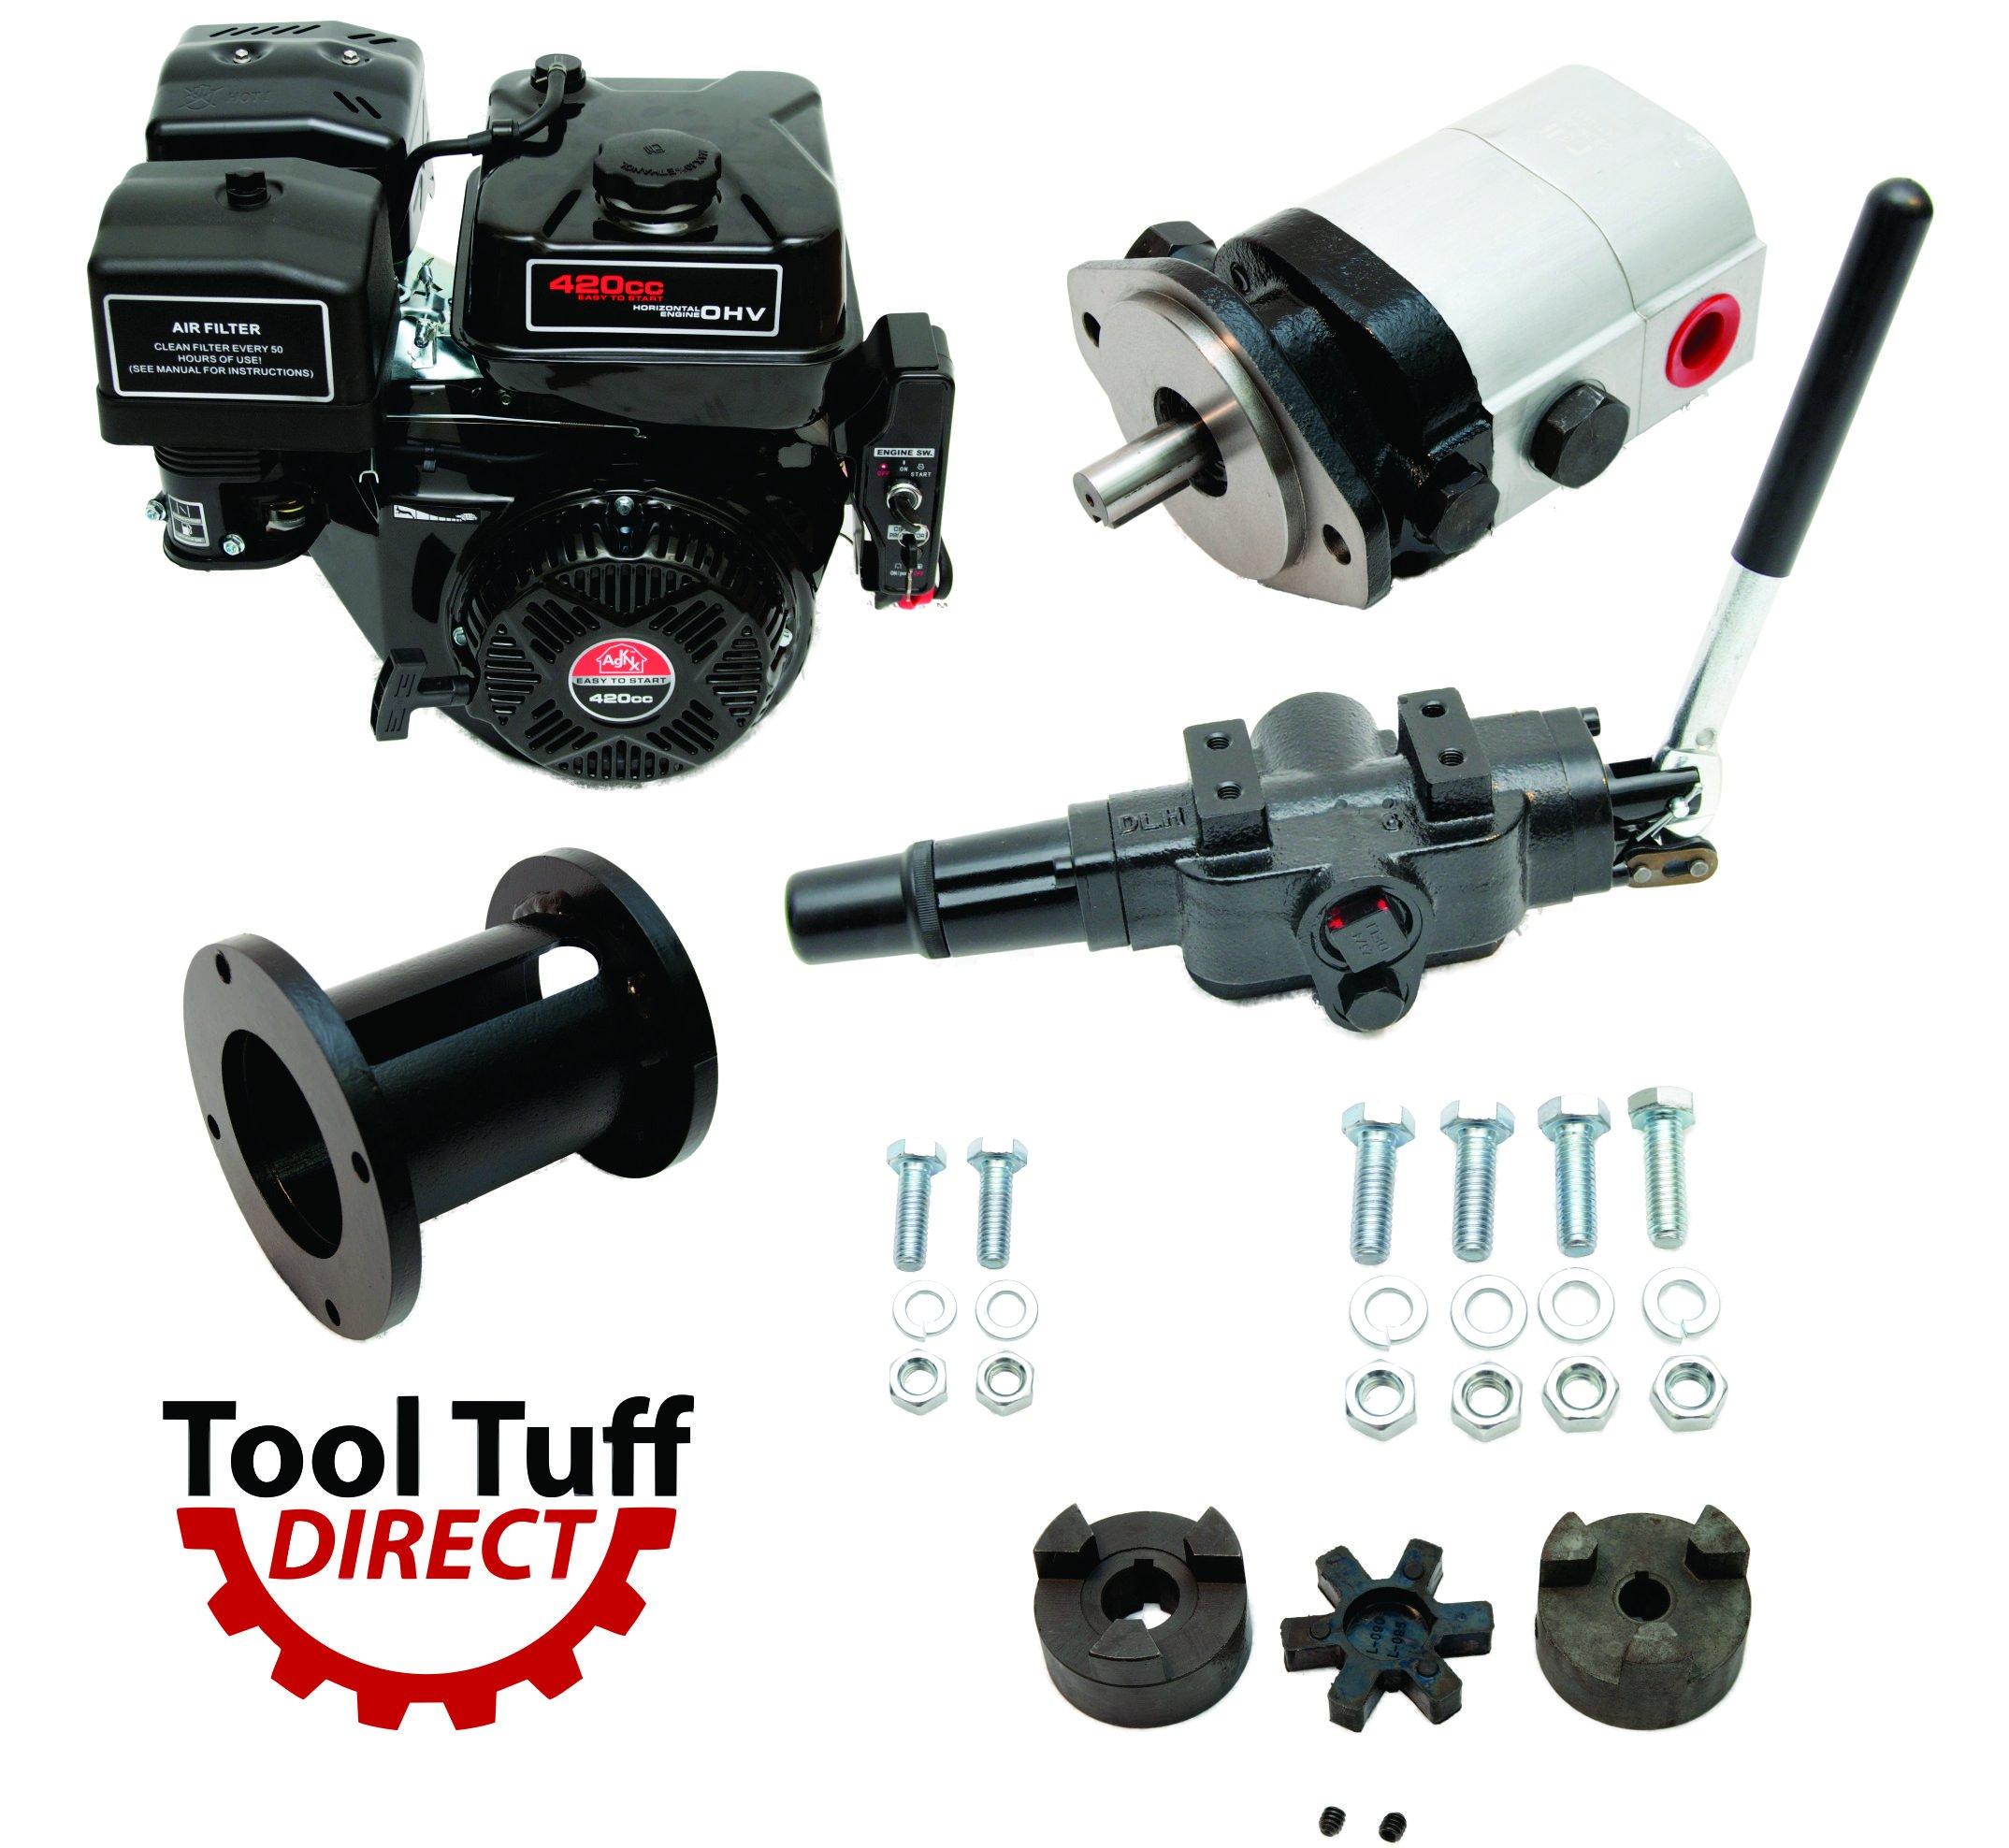 Tool Tuff Log Splitter Build Kit - 15 hp Electric-Start Engine, 28 GPM Pump, Auto-Return Valve, Coupler & Hardware